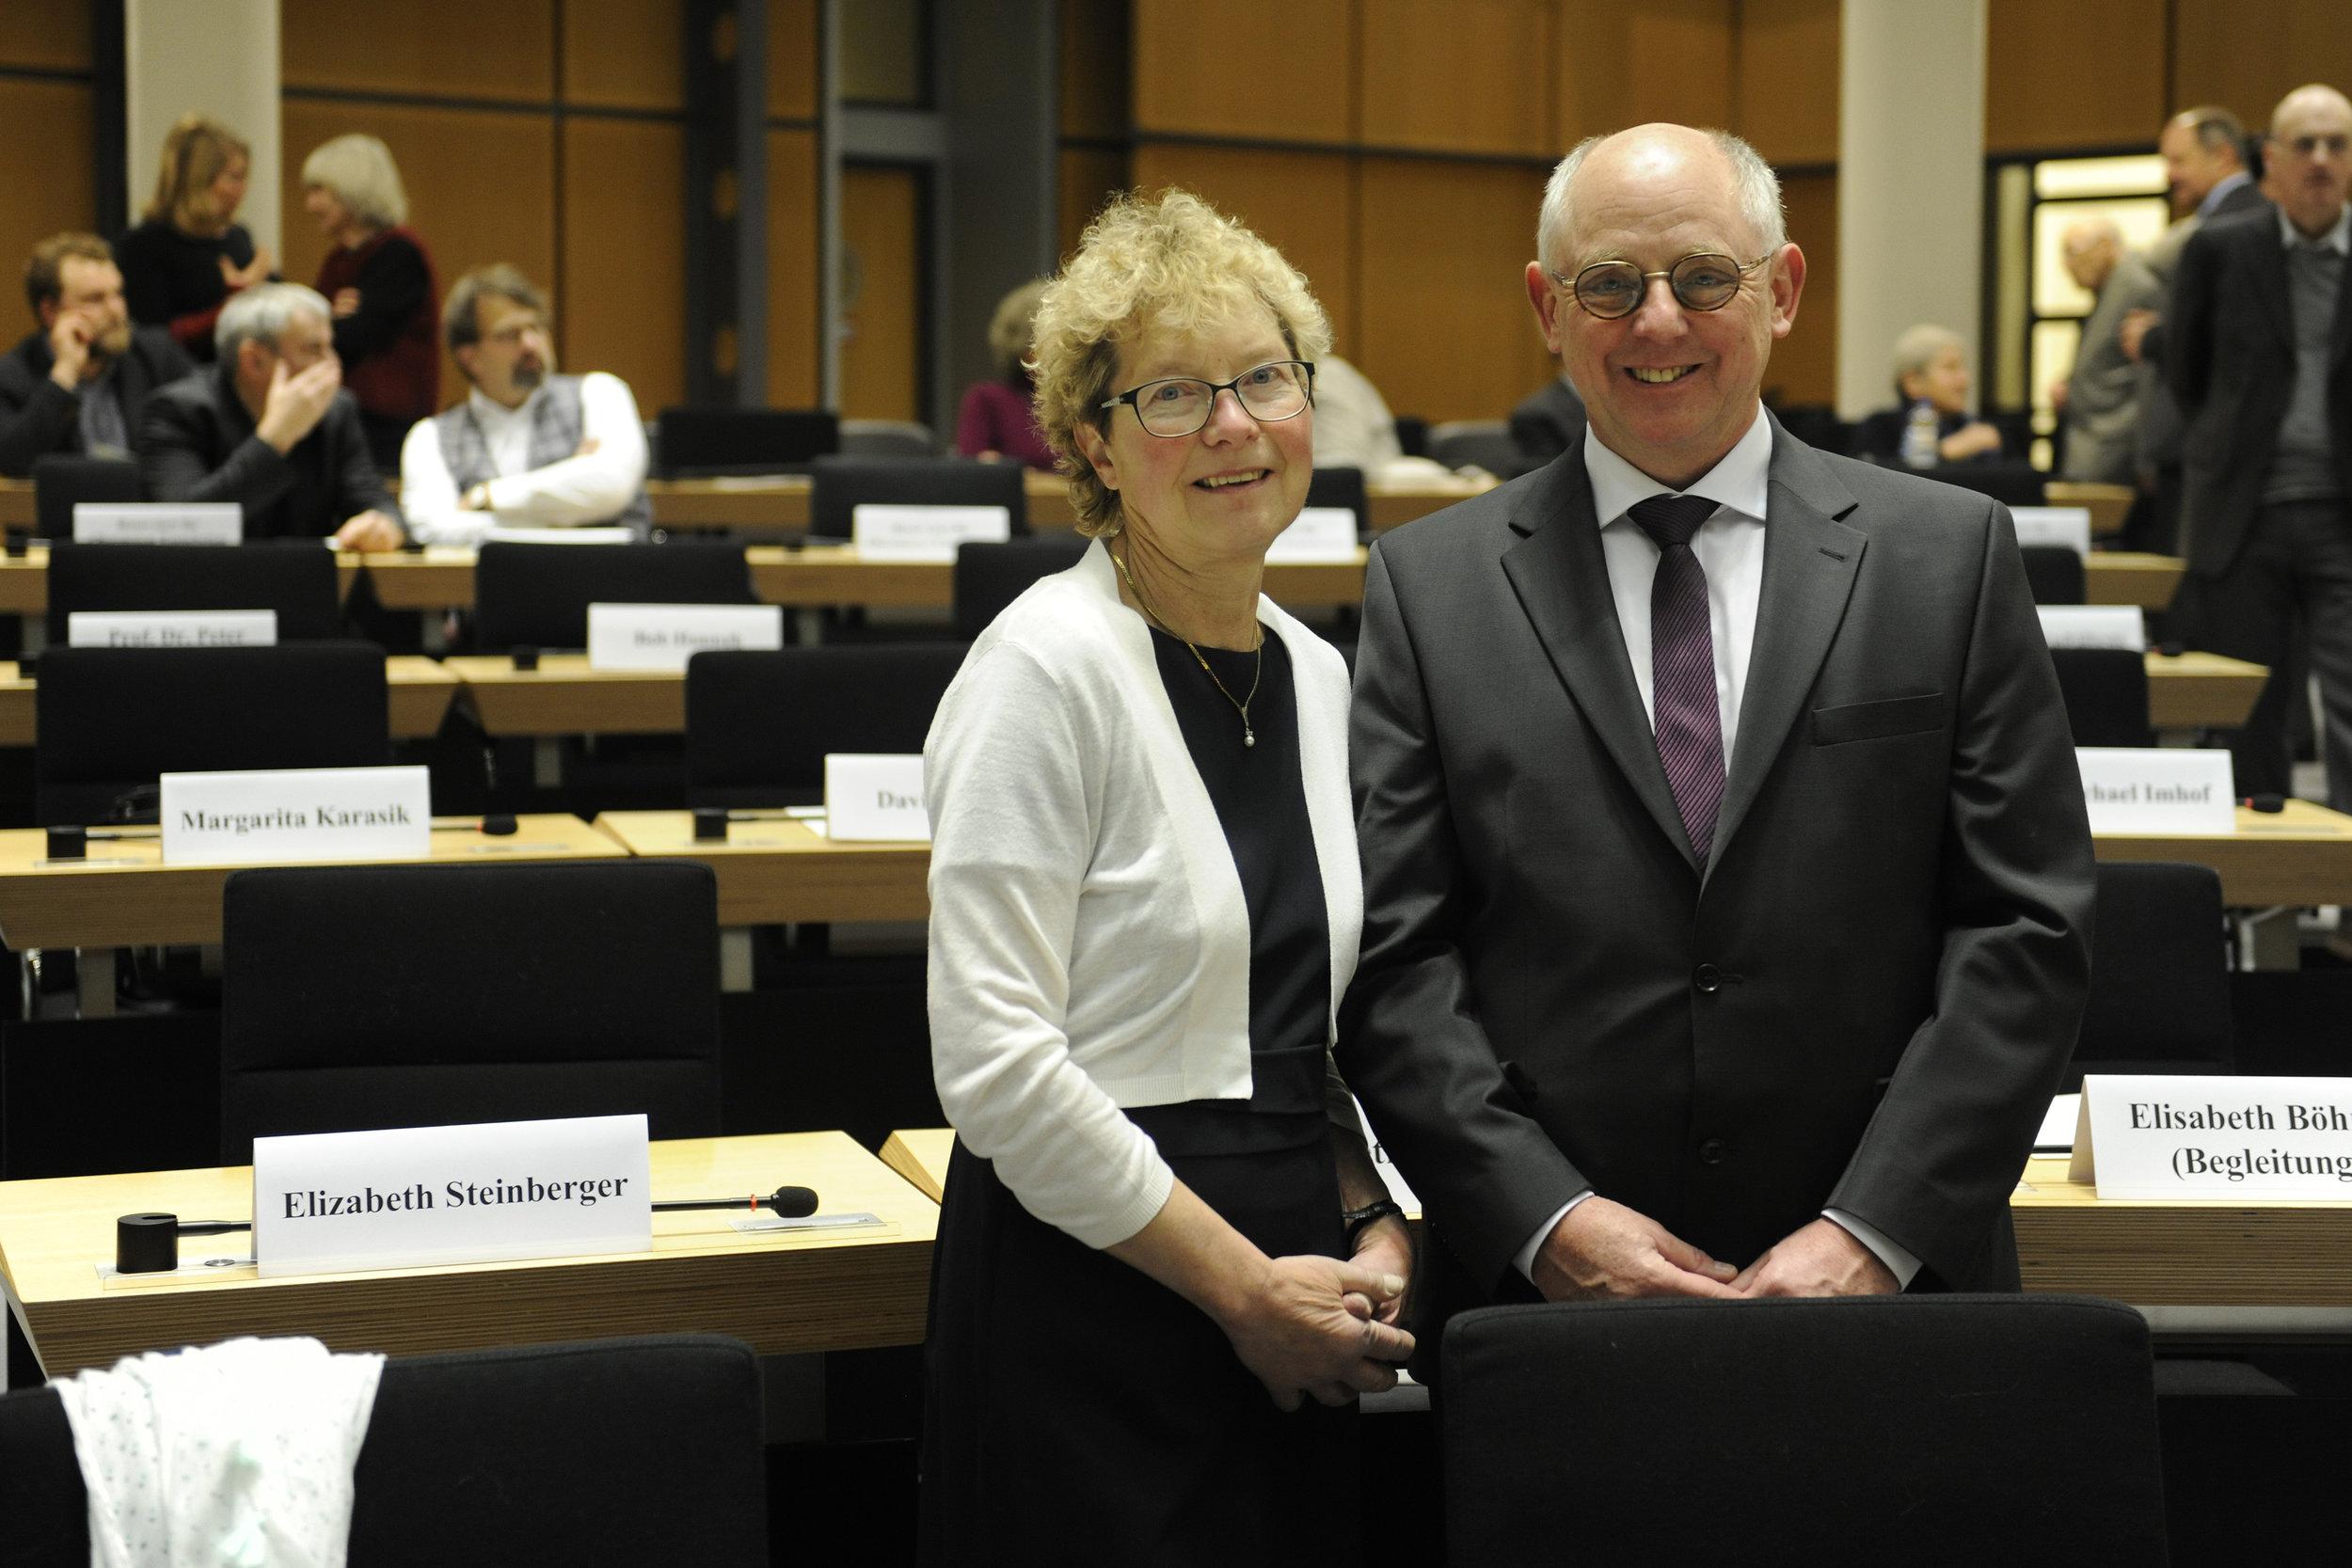 Martina and Hans-Dieter Graf